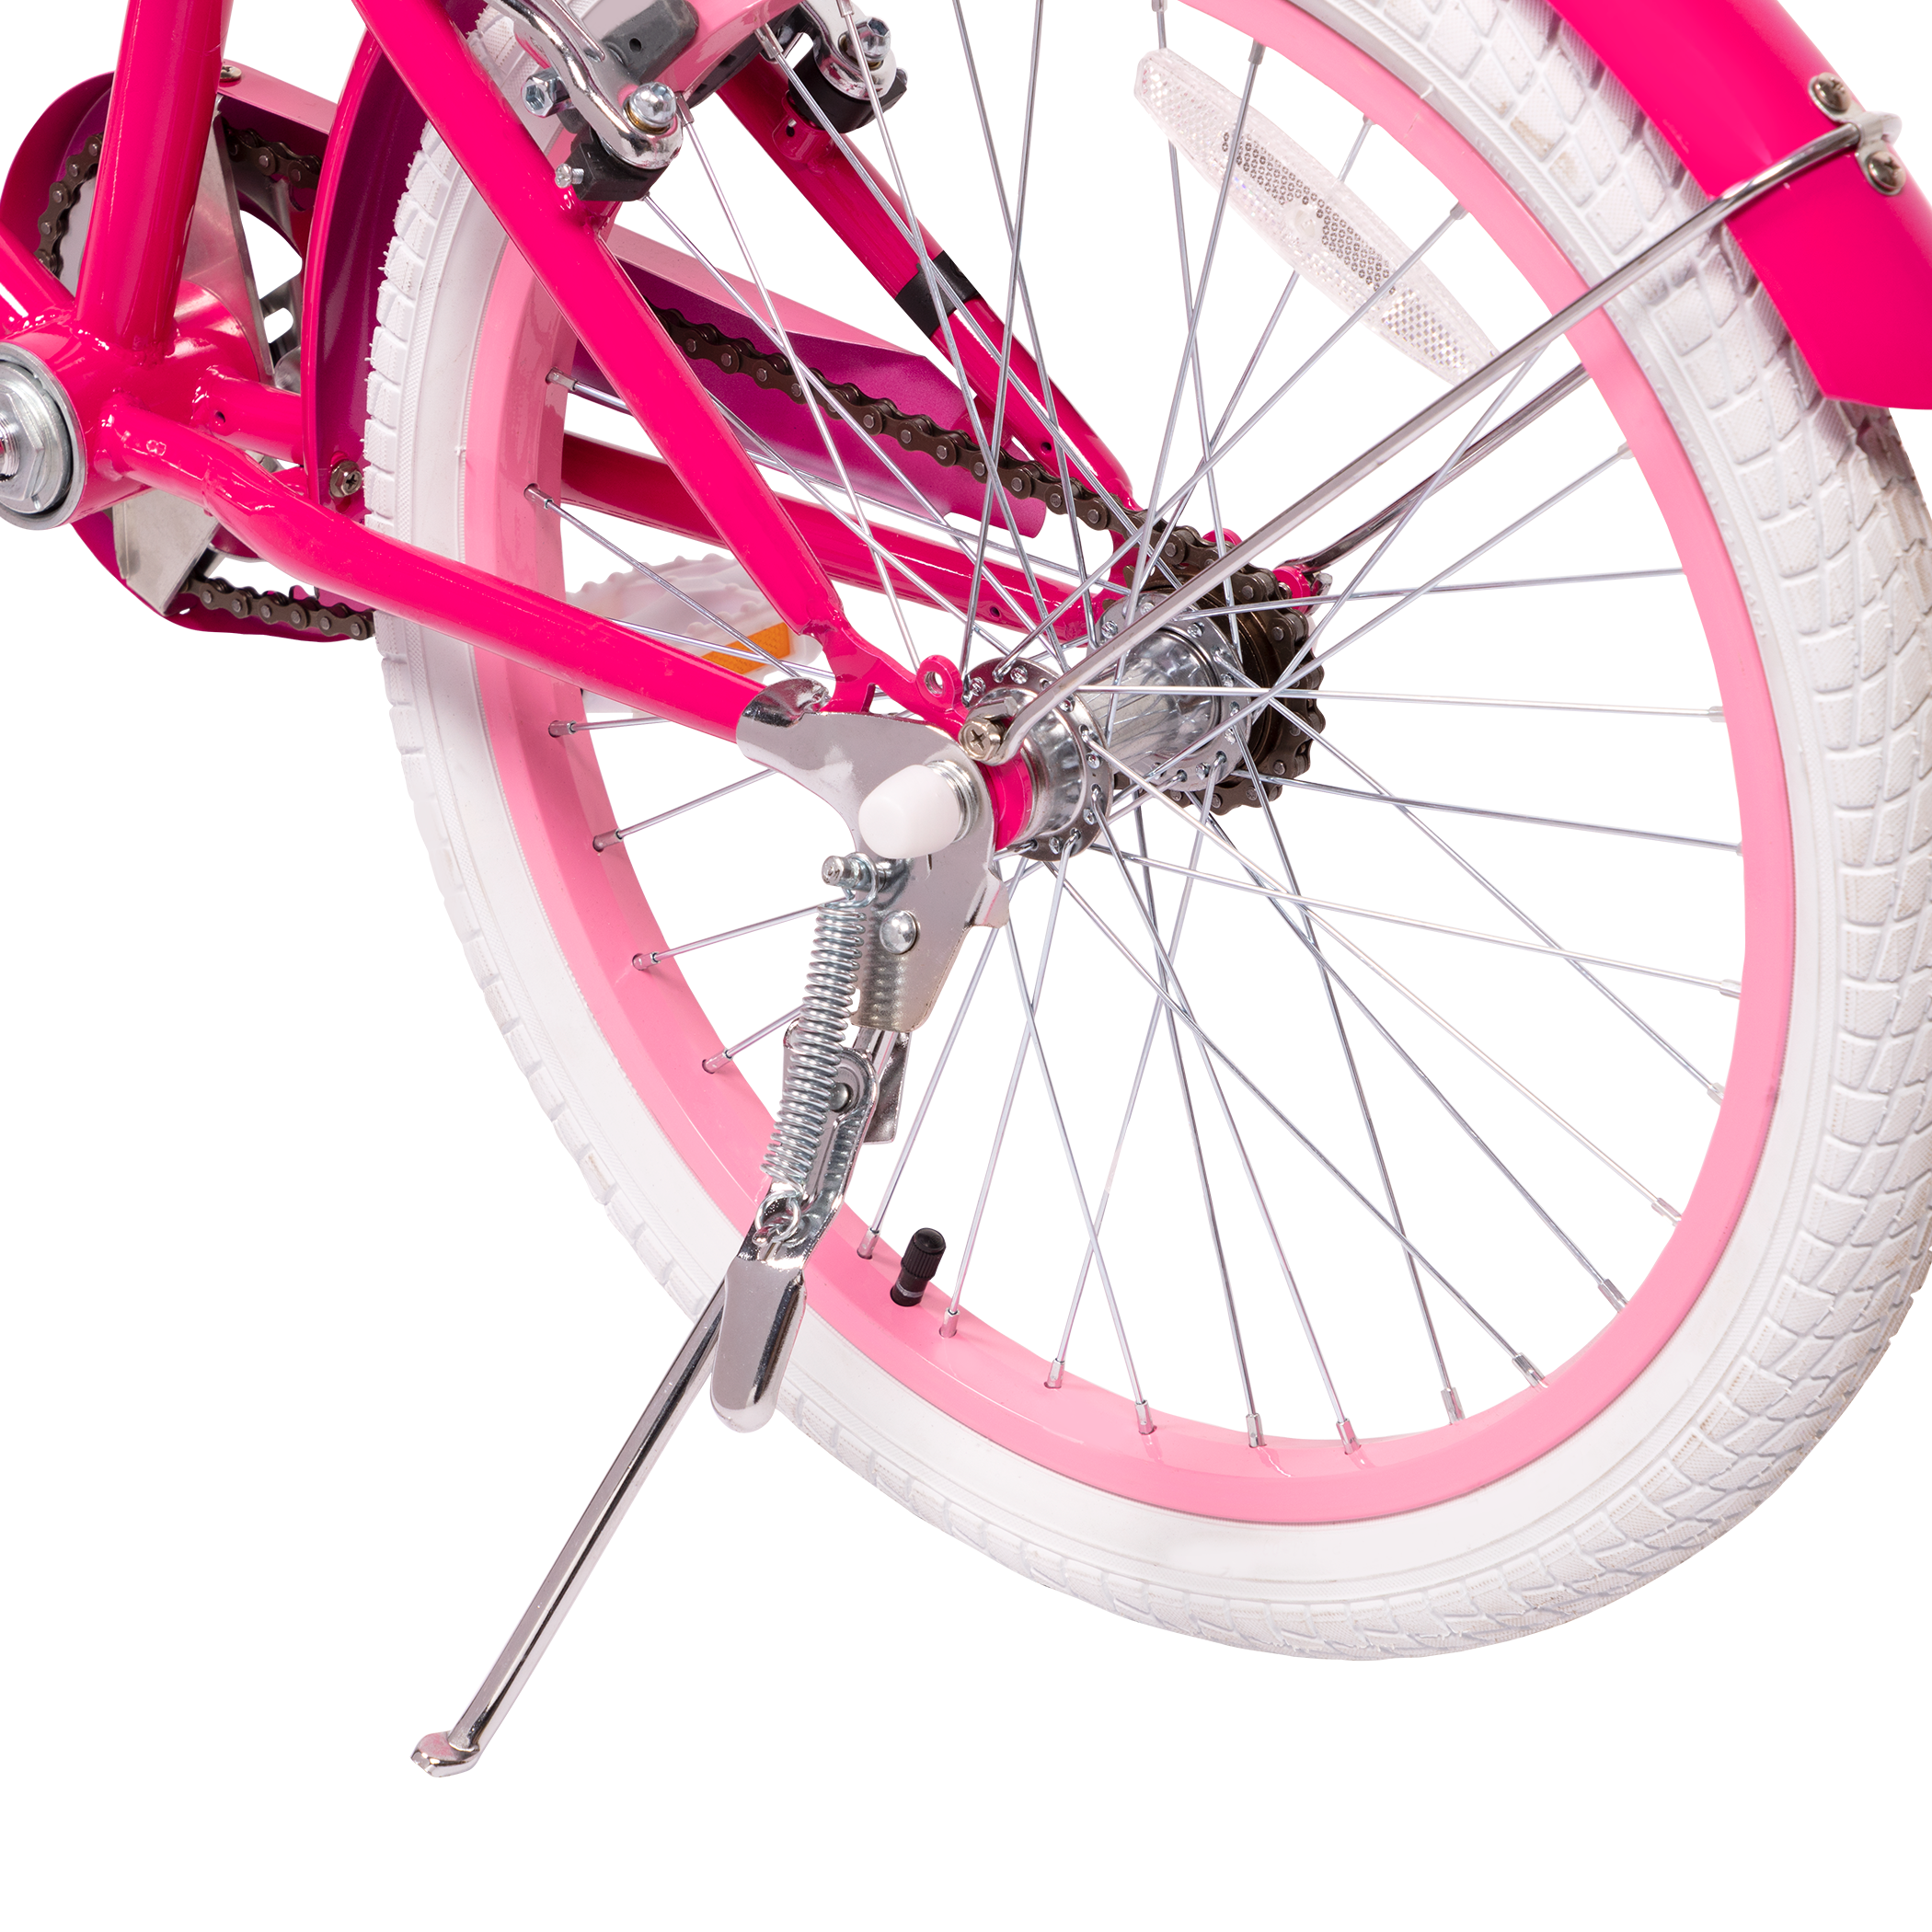 OG Bicycle for kids kickstand detail04